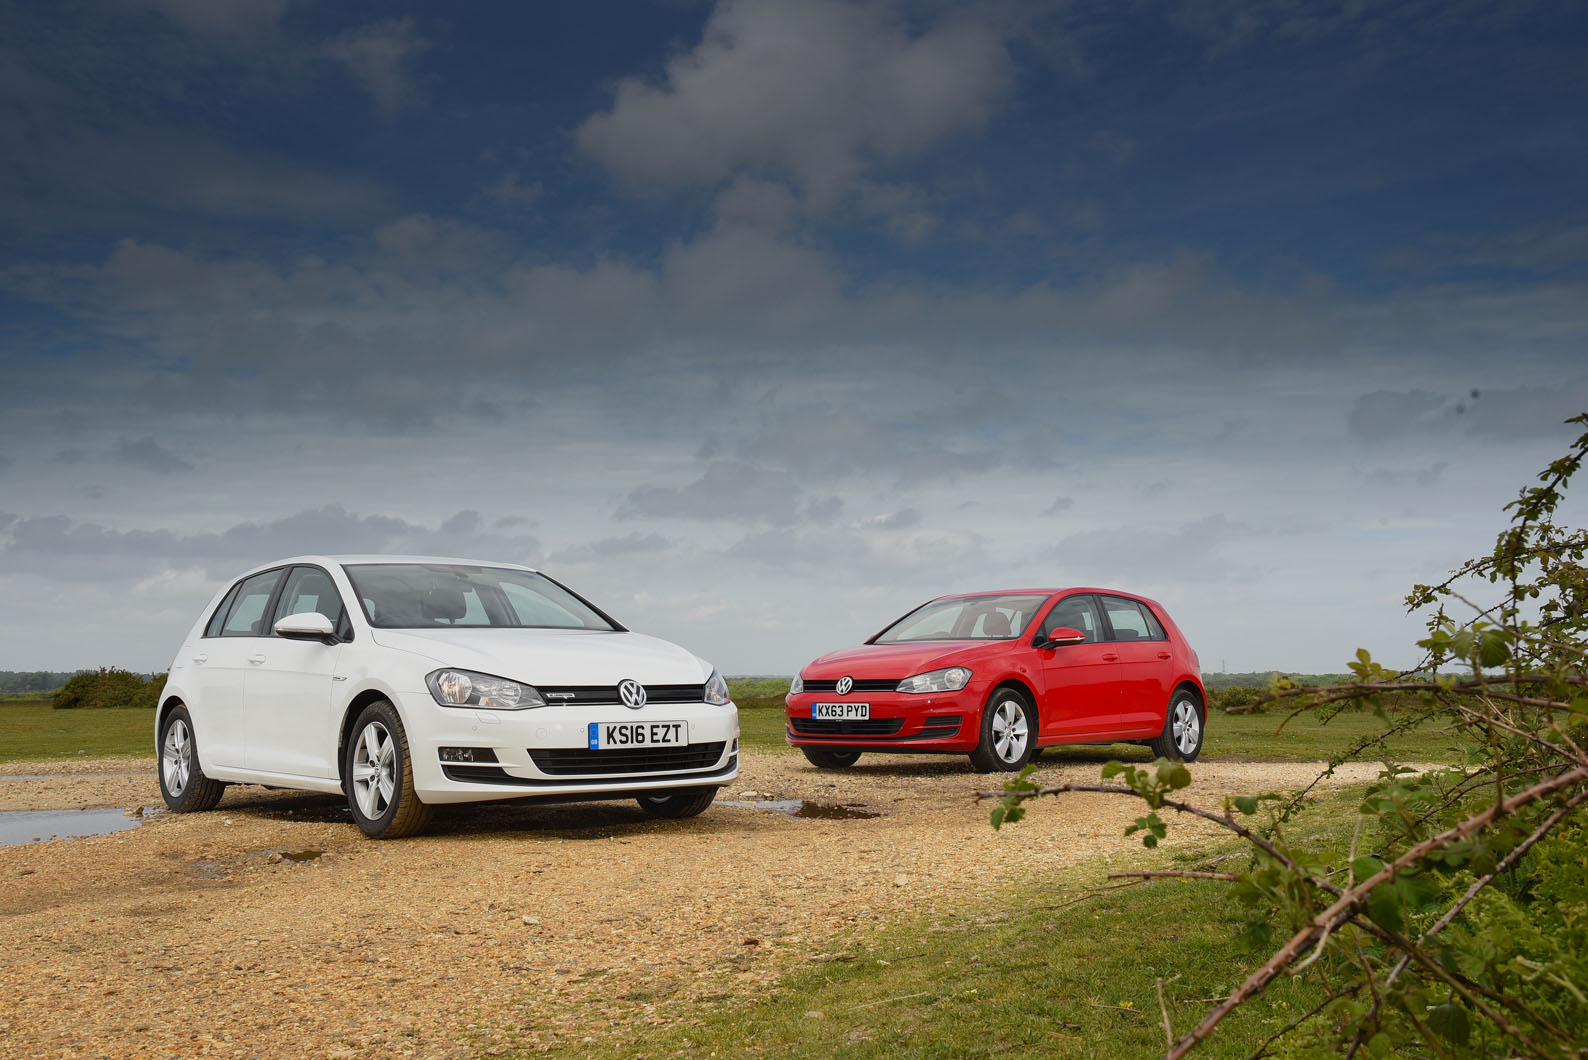 Volkswagen Golf 1 0 Tsi Long Term Test Review First Report Autocar